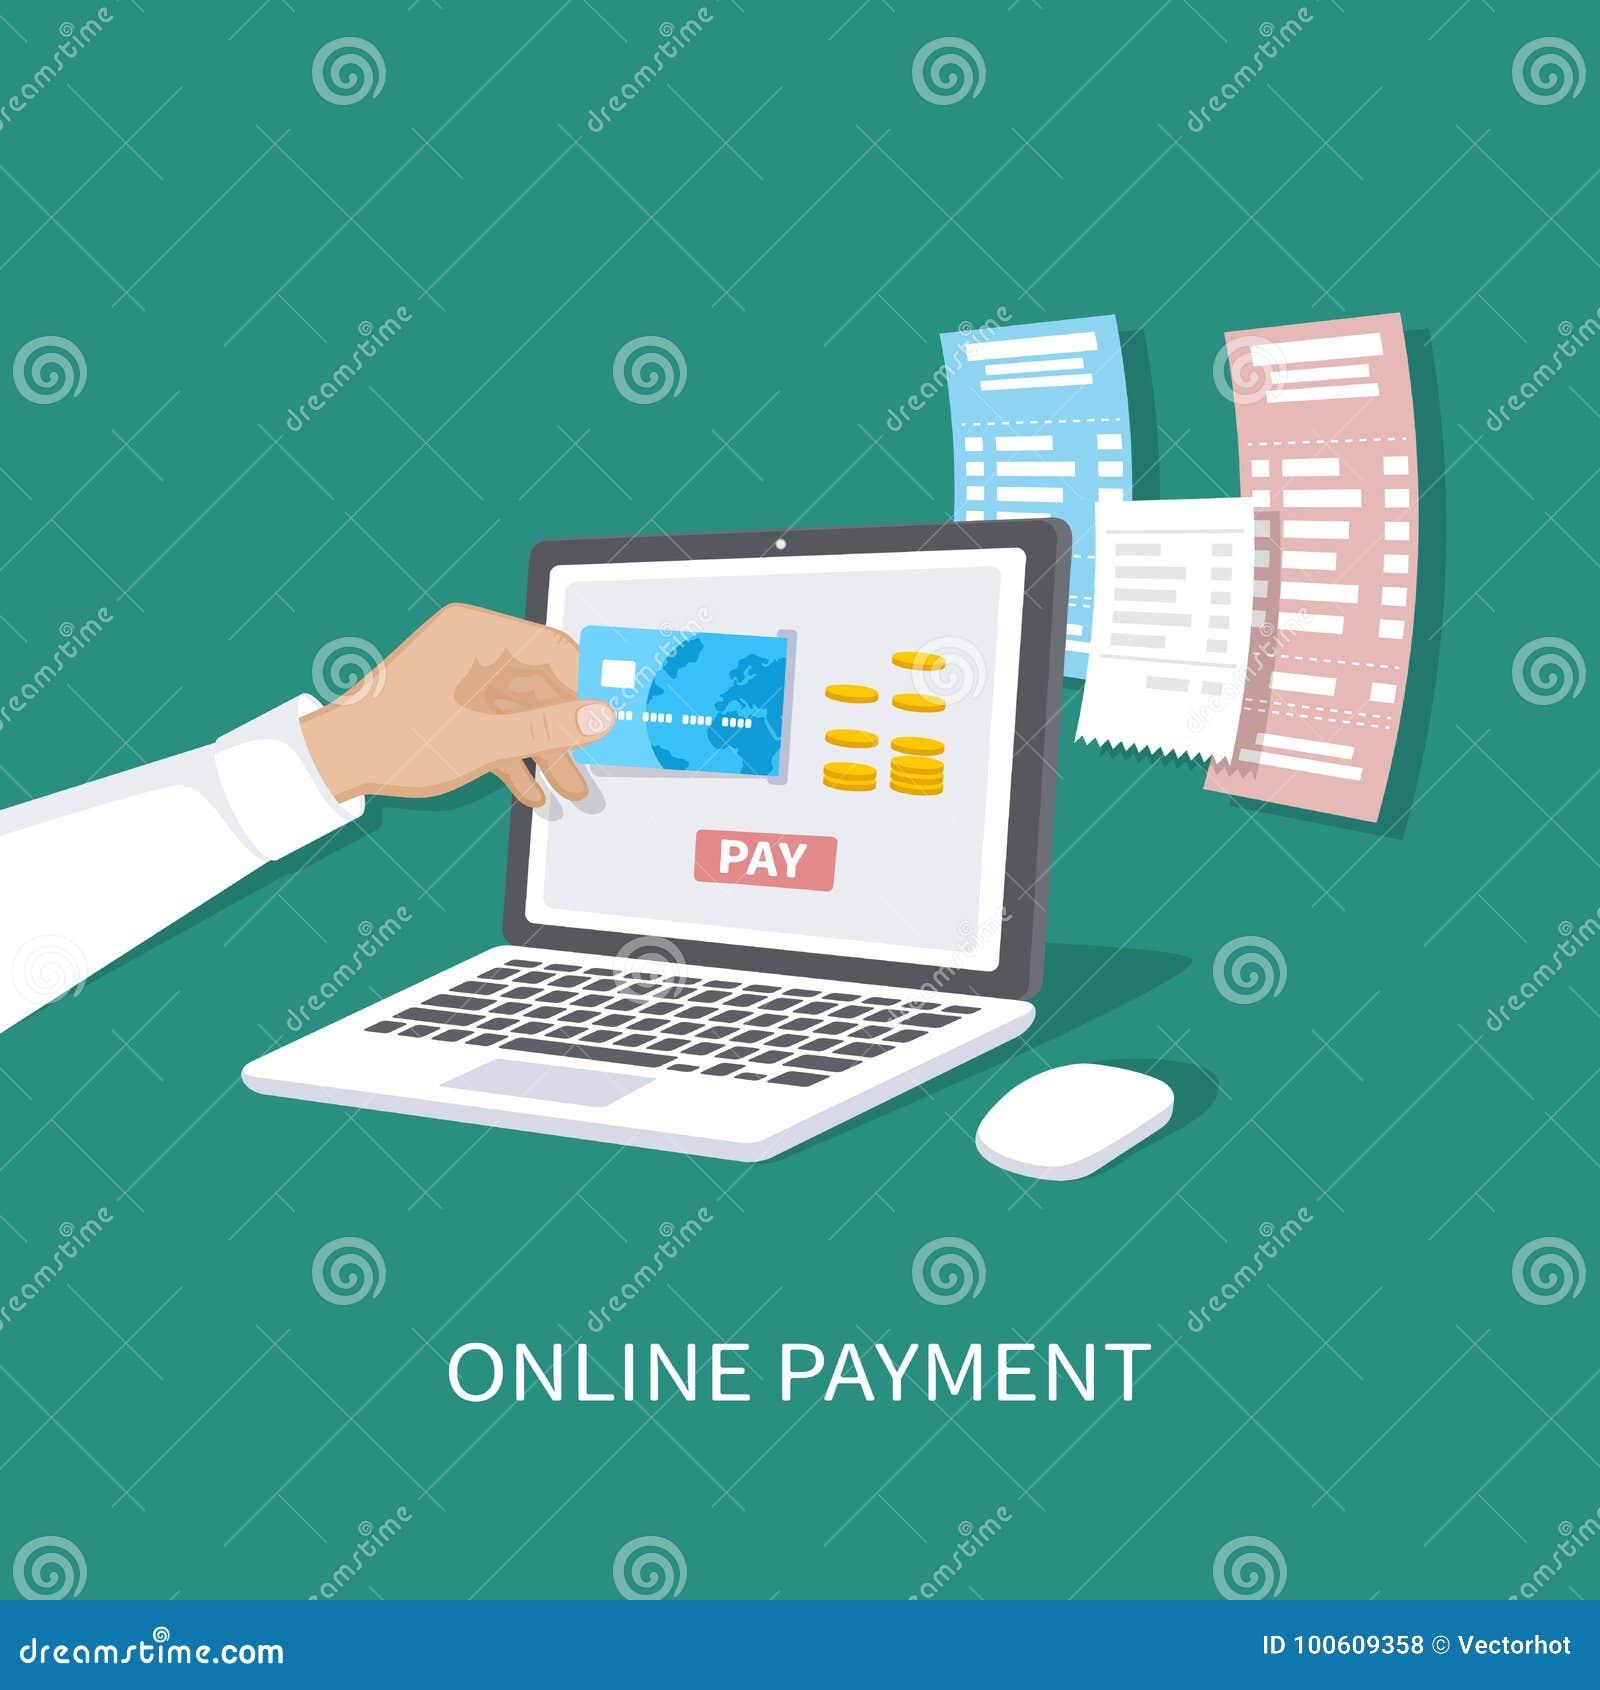 Isolerat på framförd vit background Betalning av räkningar, kontroller, online-shopping via mobilen app E-kommers elektronisk aff